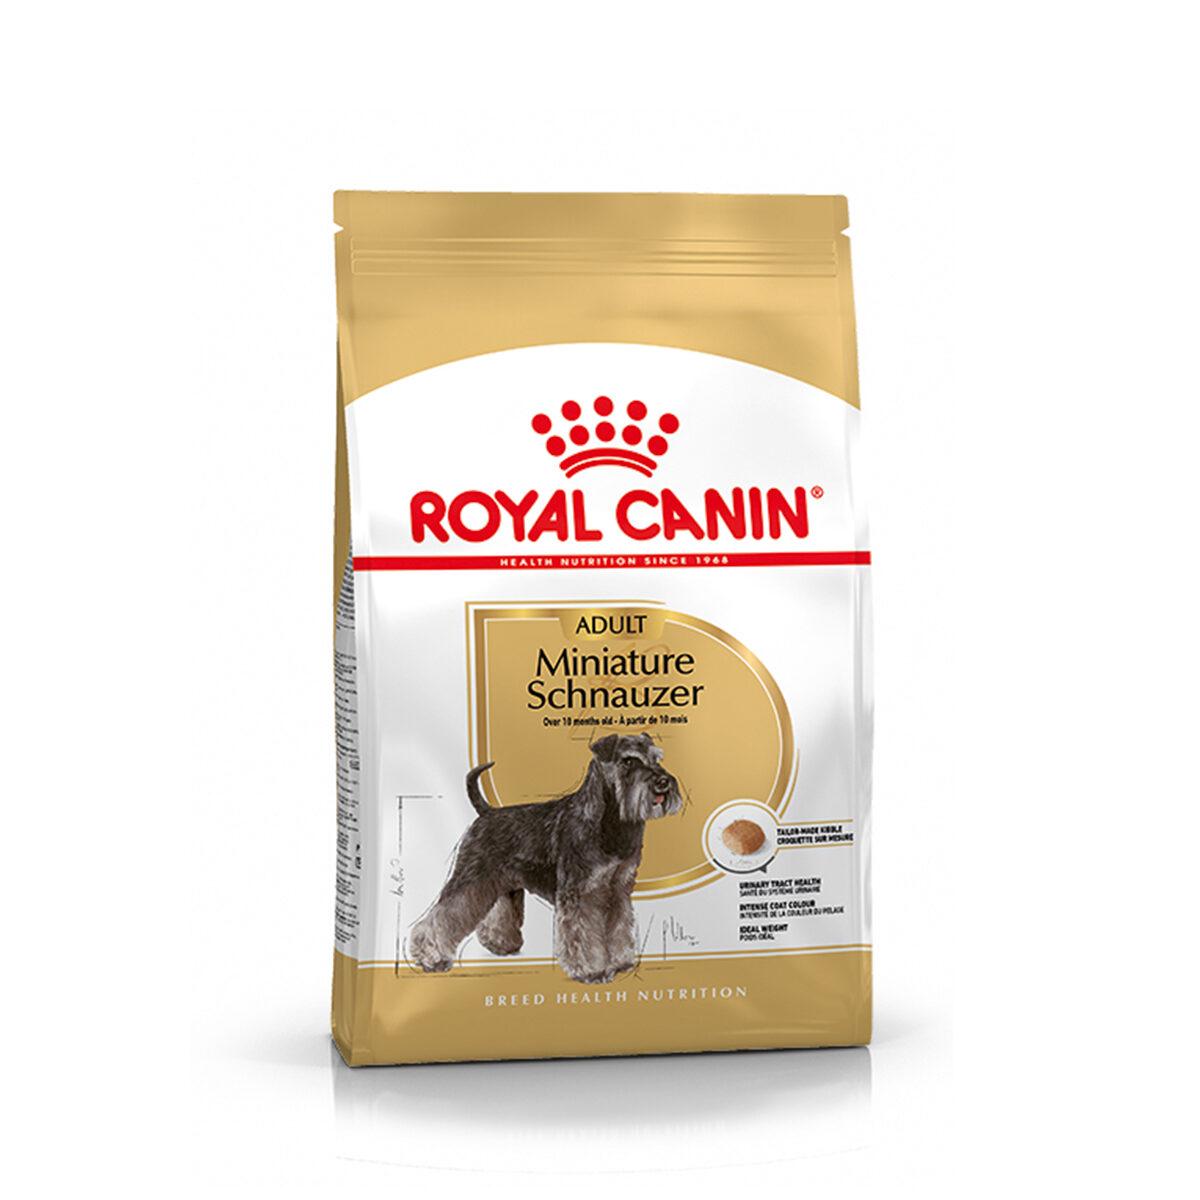 Royal Canin Miniature Schnauzer Adult Hondenvoer 3 kg